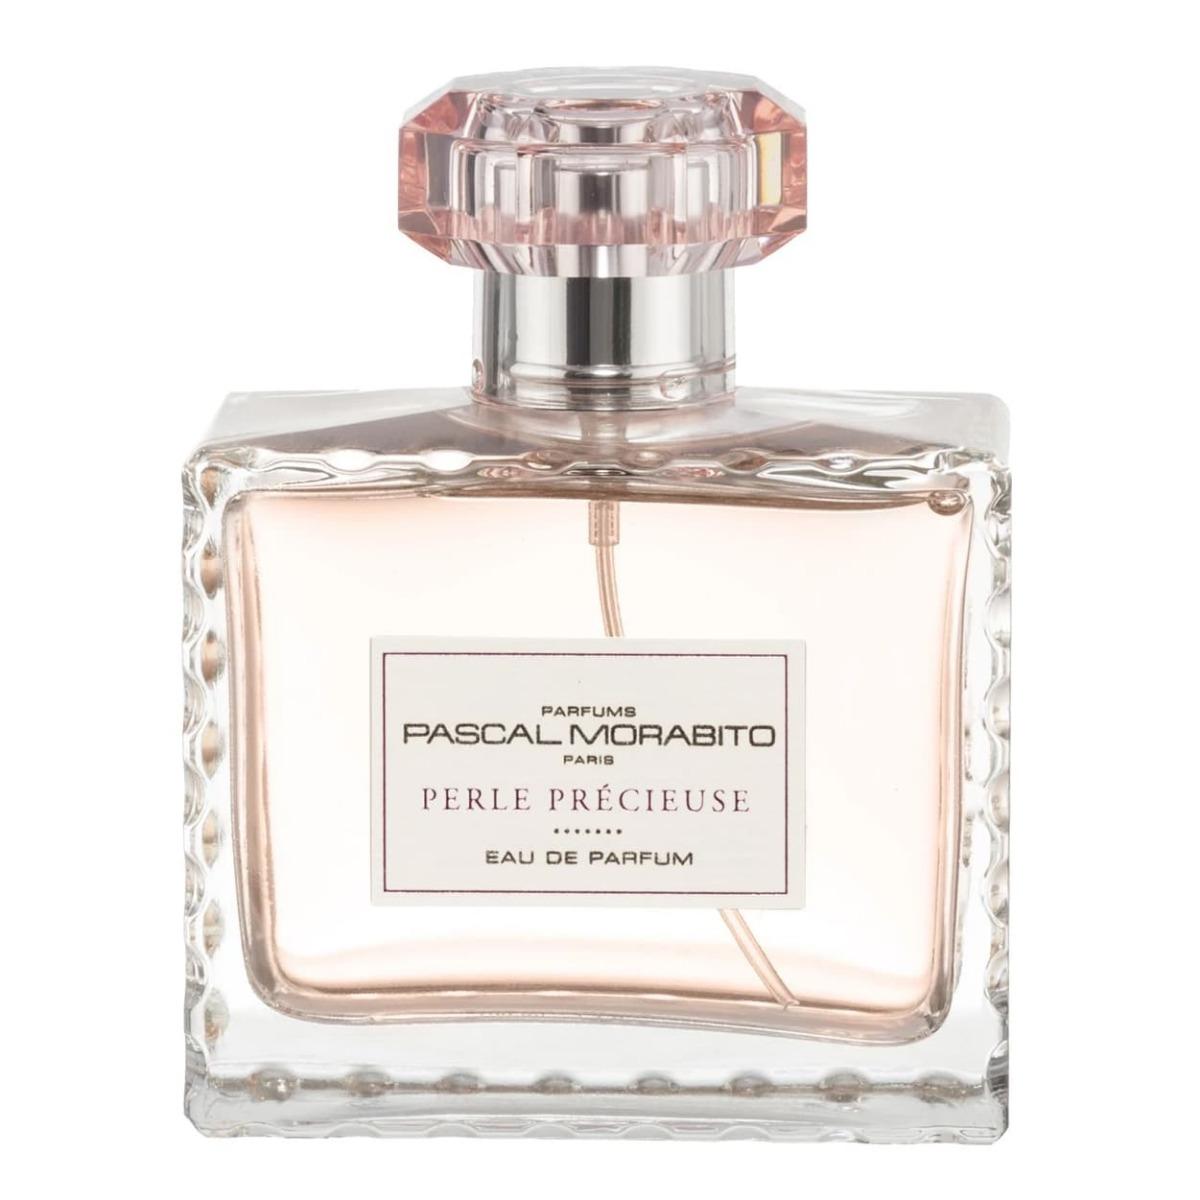 Pascal Morabito - Perle Précieuse - Eau de Parfum